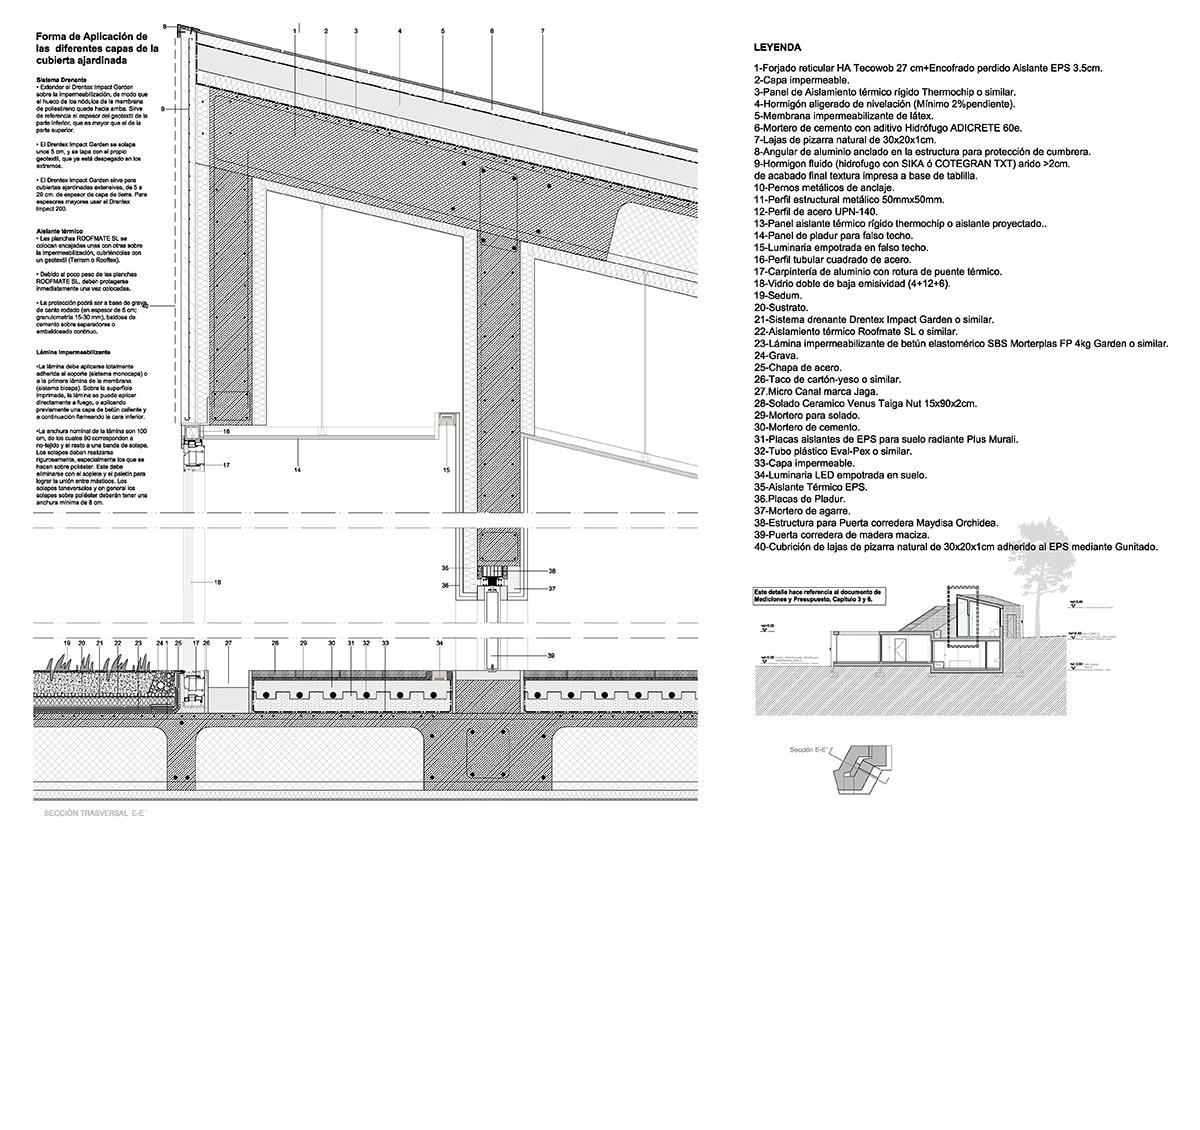 Planos Generales_Página_23.jpg